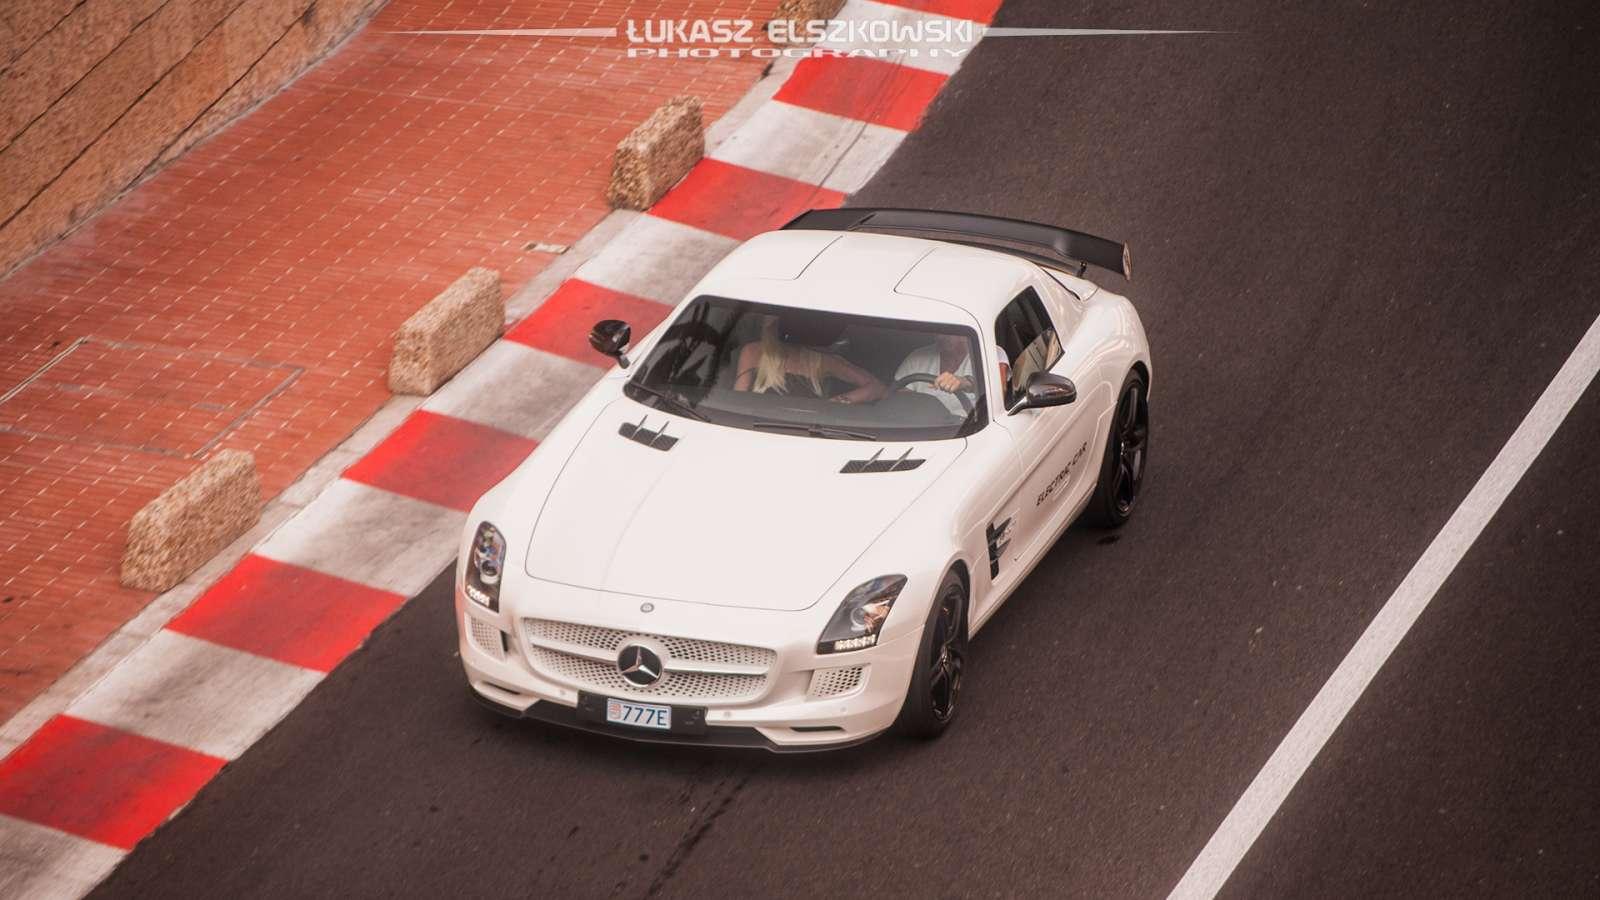 Mercedes SLS AMG electric Monaco